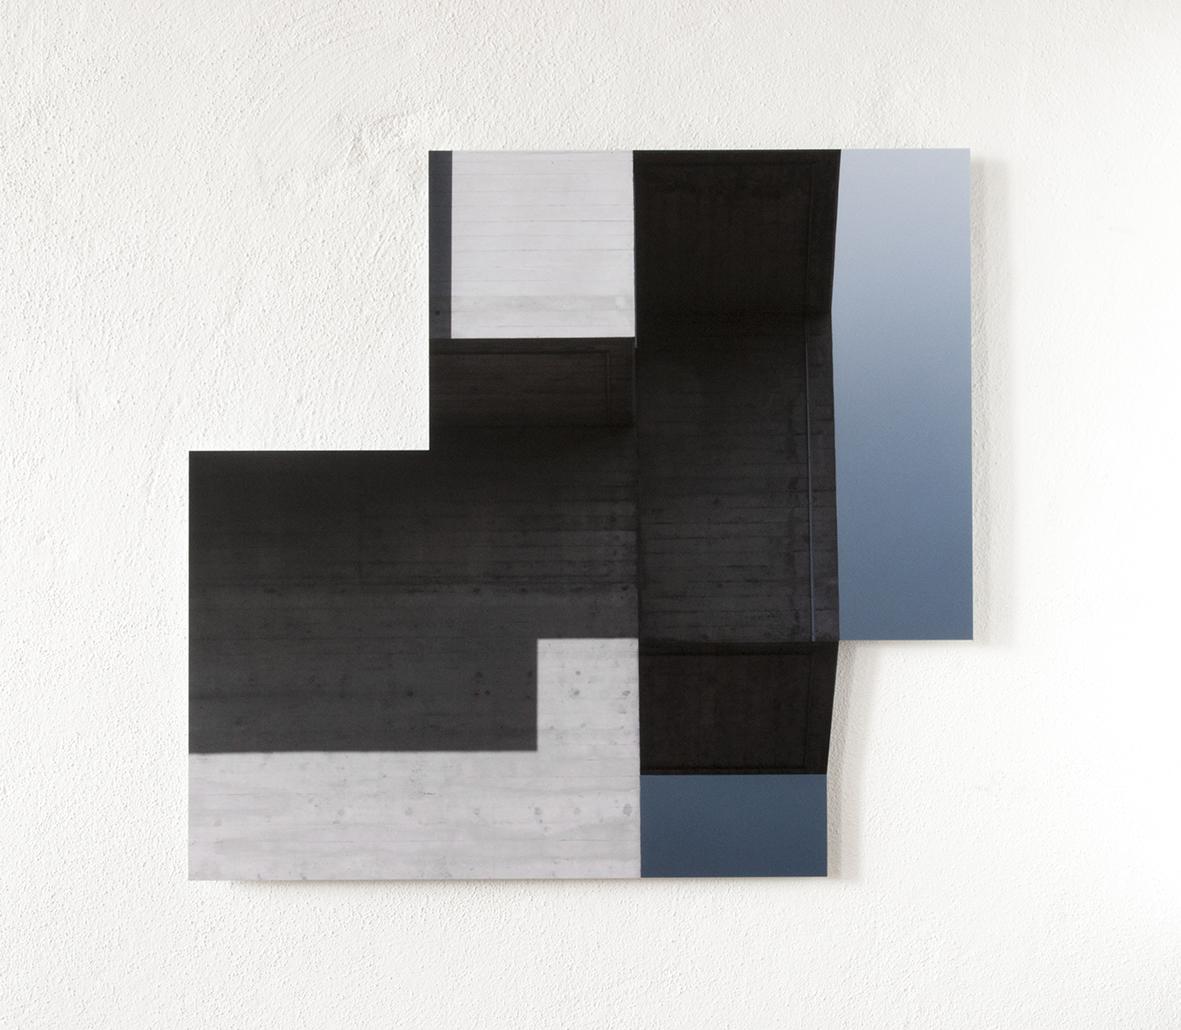 form 01, 2018 |Pigment Print auf Aludibond |78 x 84 cm